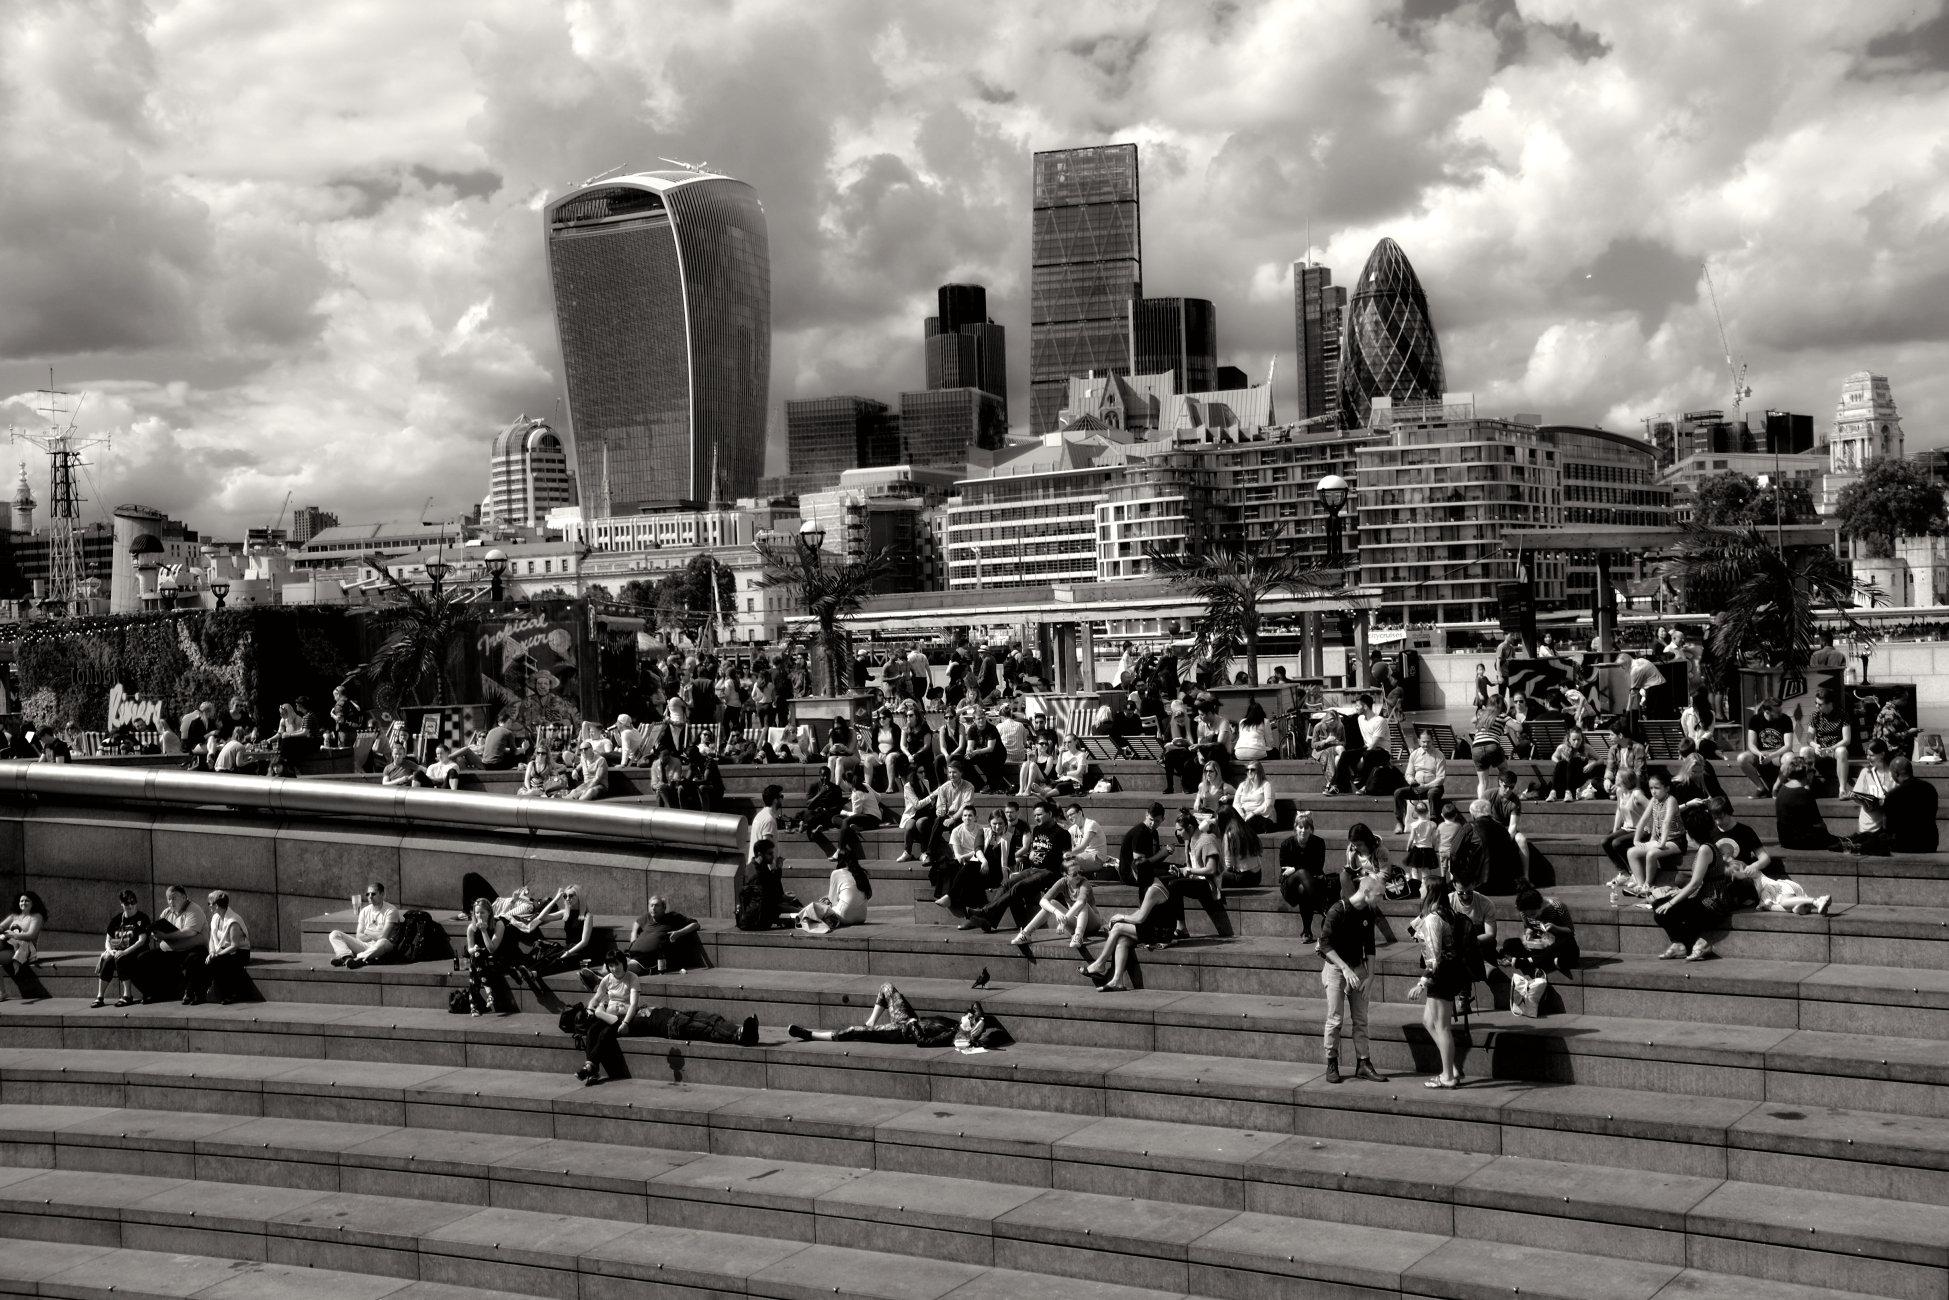 London, Saturday